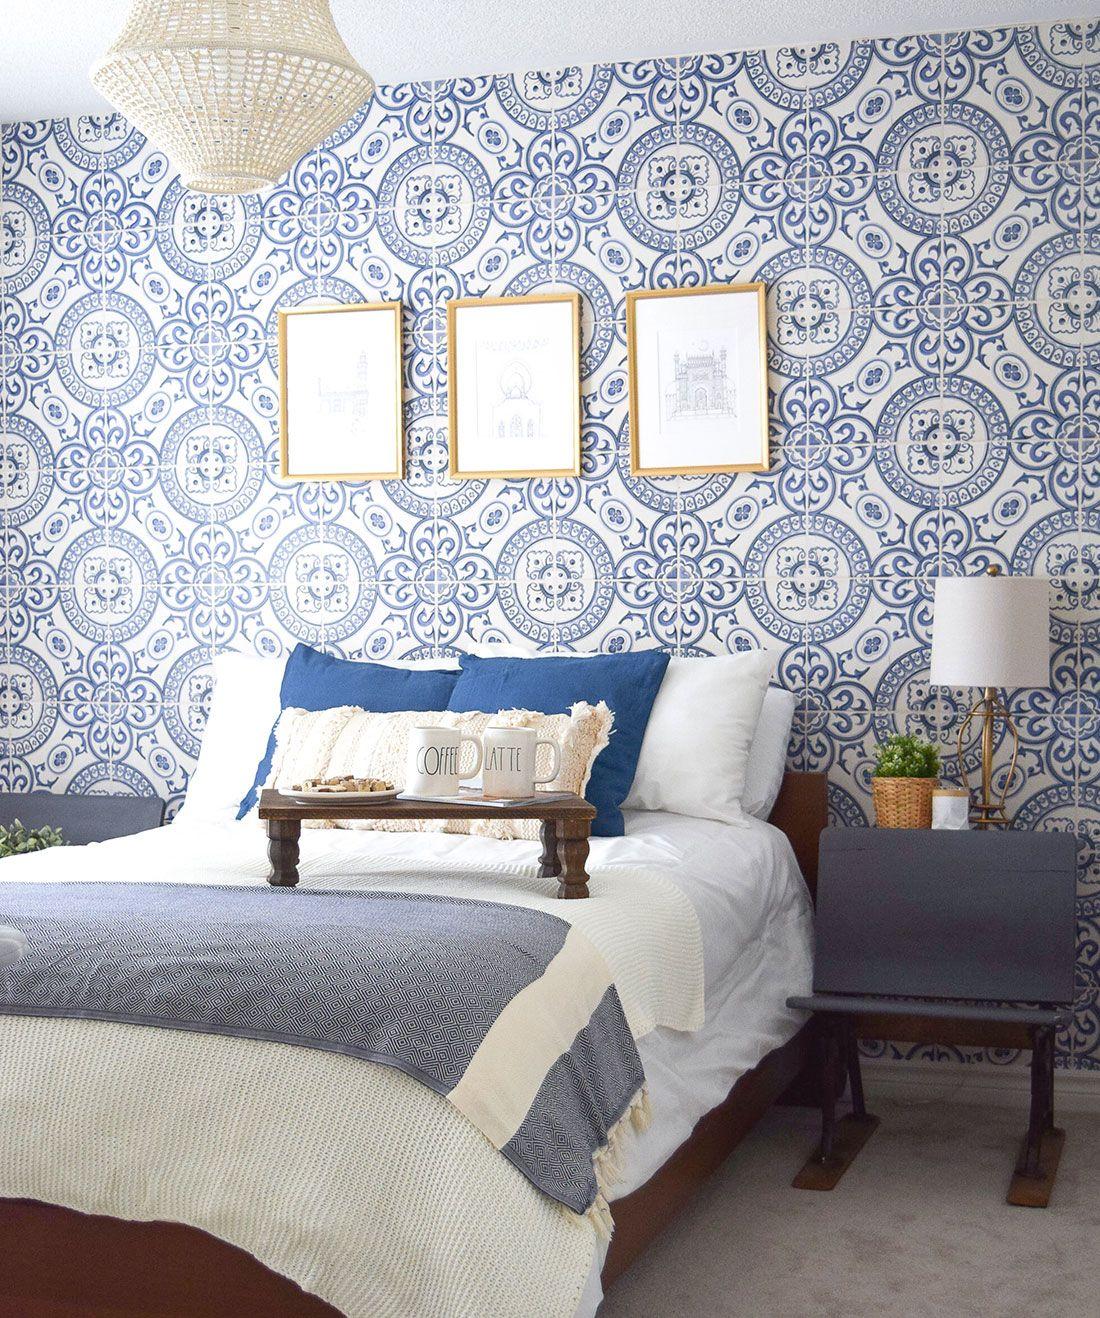 Wallpaper That Looks Like Cement Tile